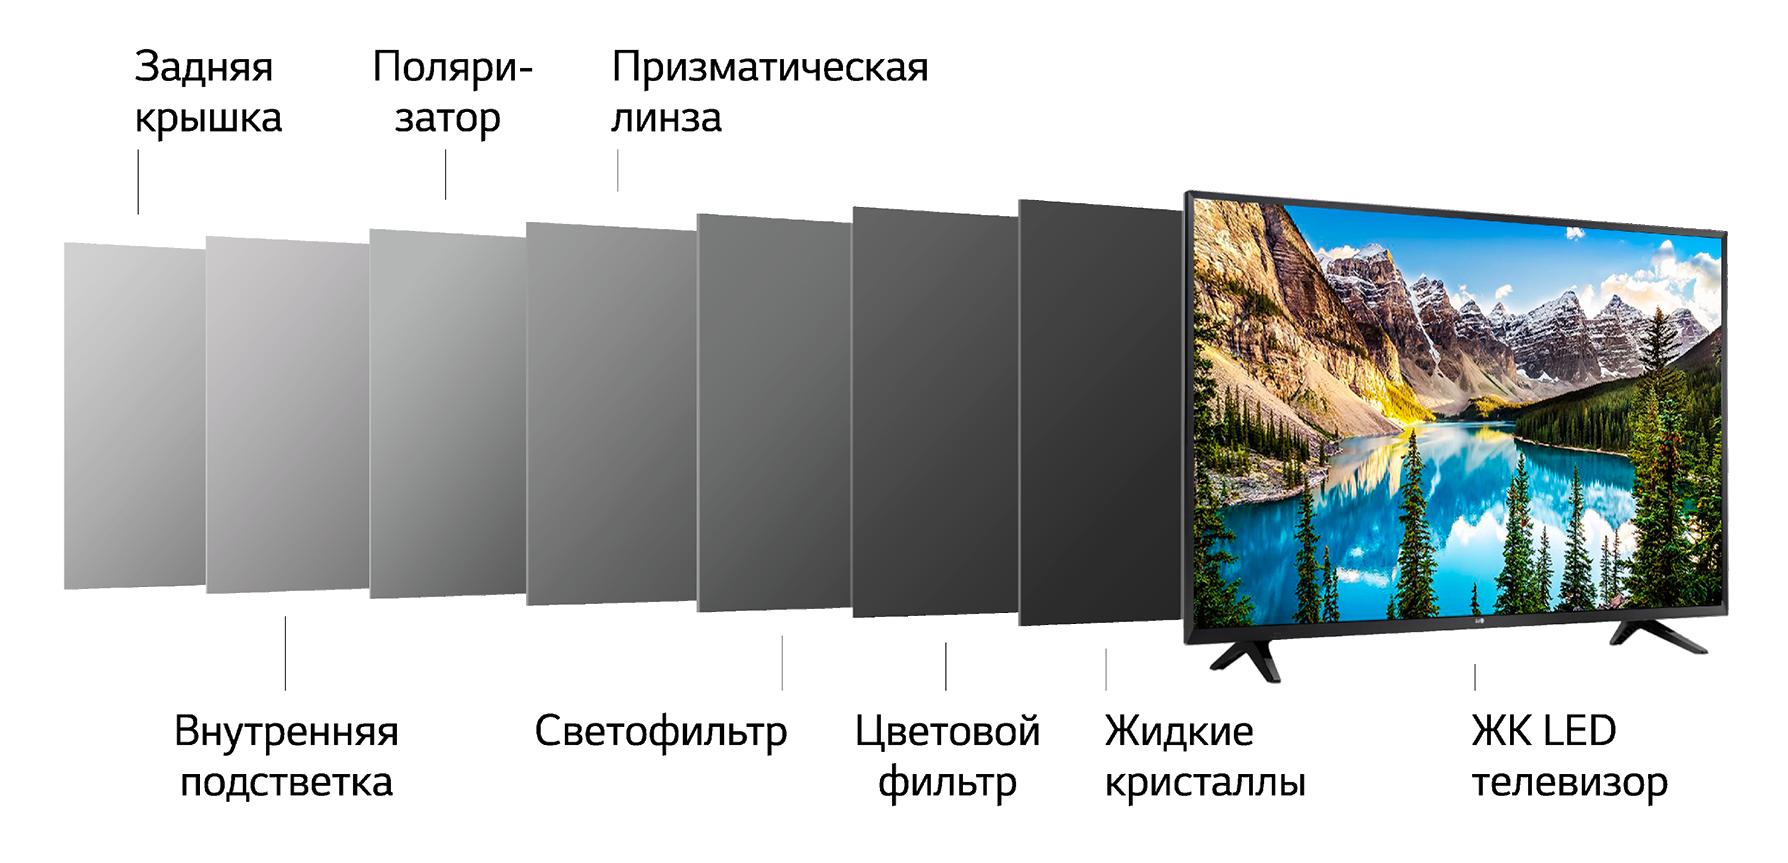 Телевизоры жк размеры экрана